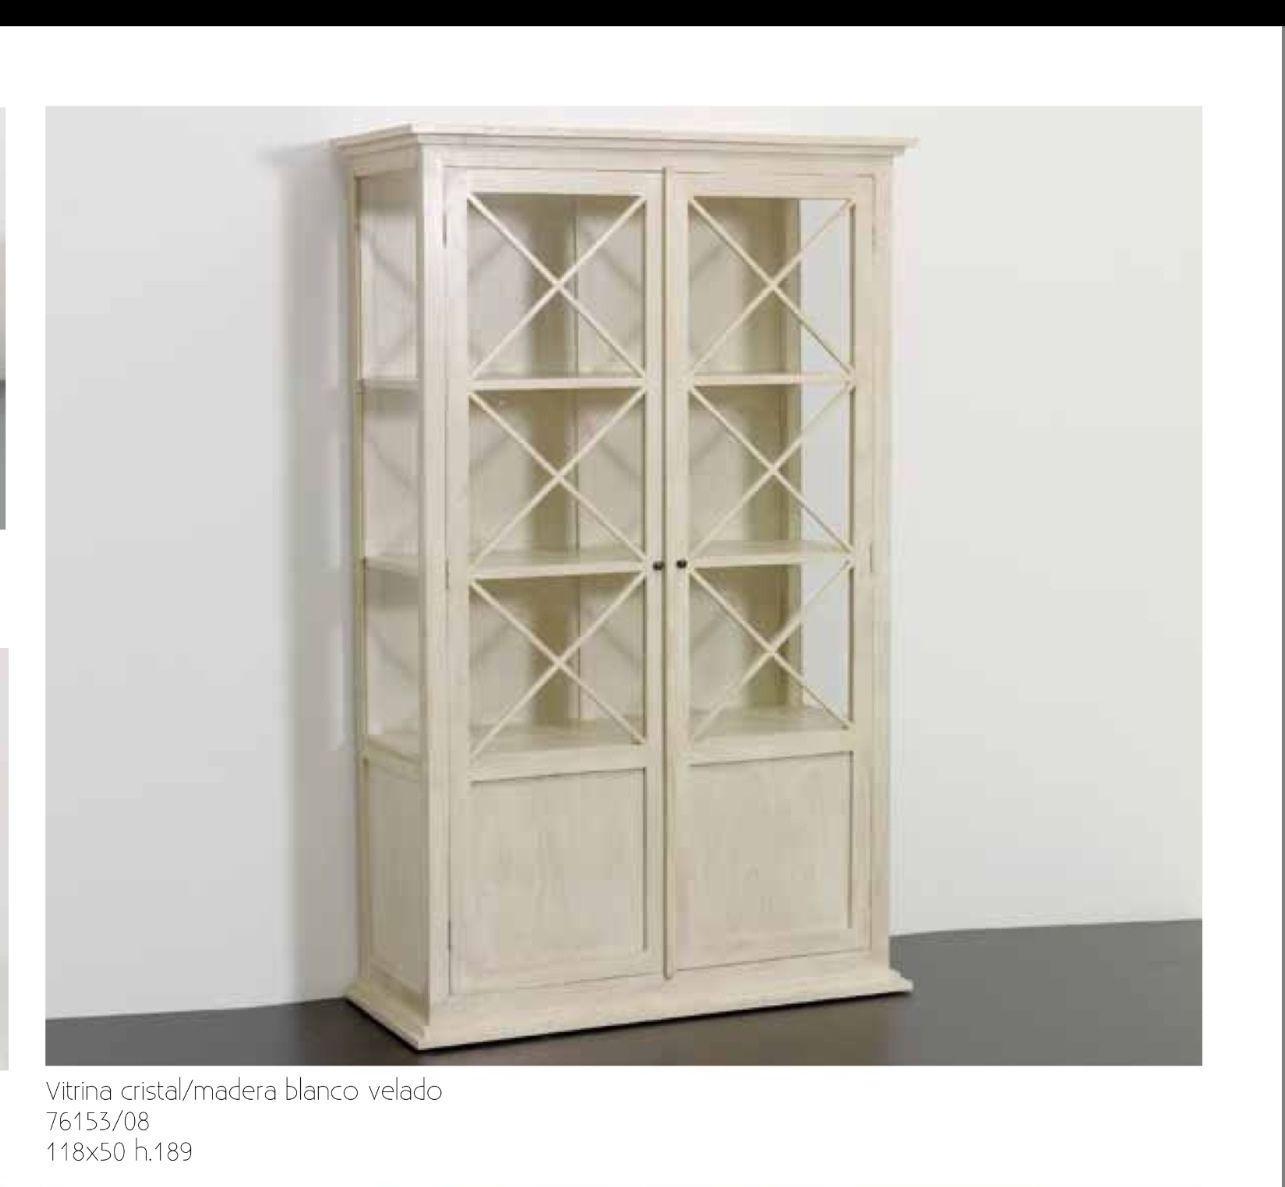 Librería Vitrina madera blanco roto y cristal: Catálogo de Ste Odile Decoración